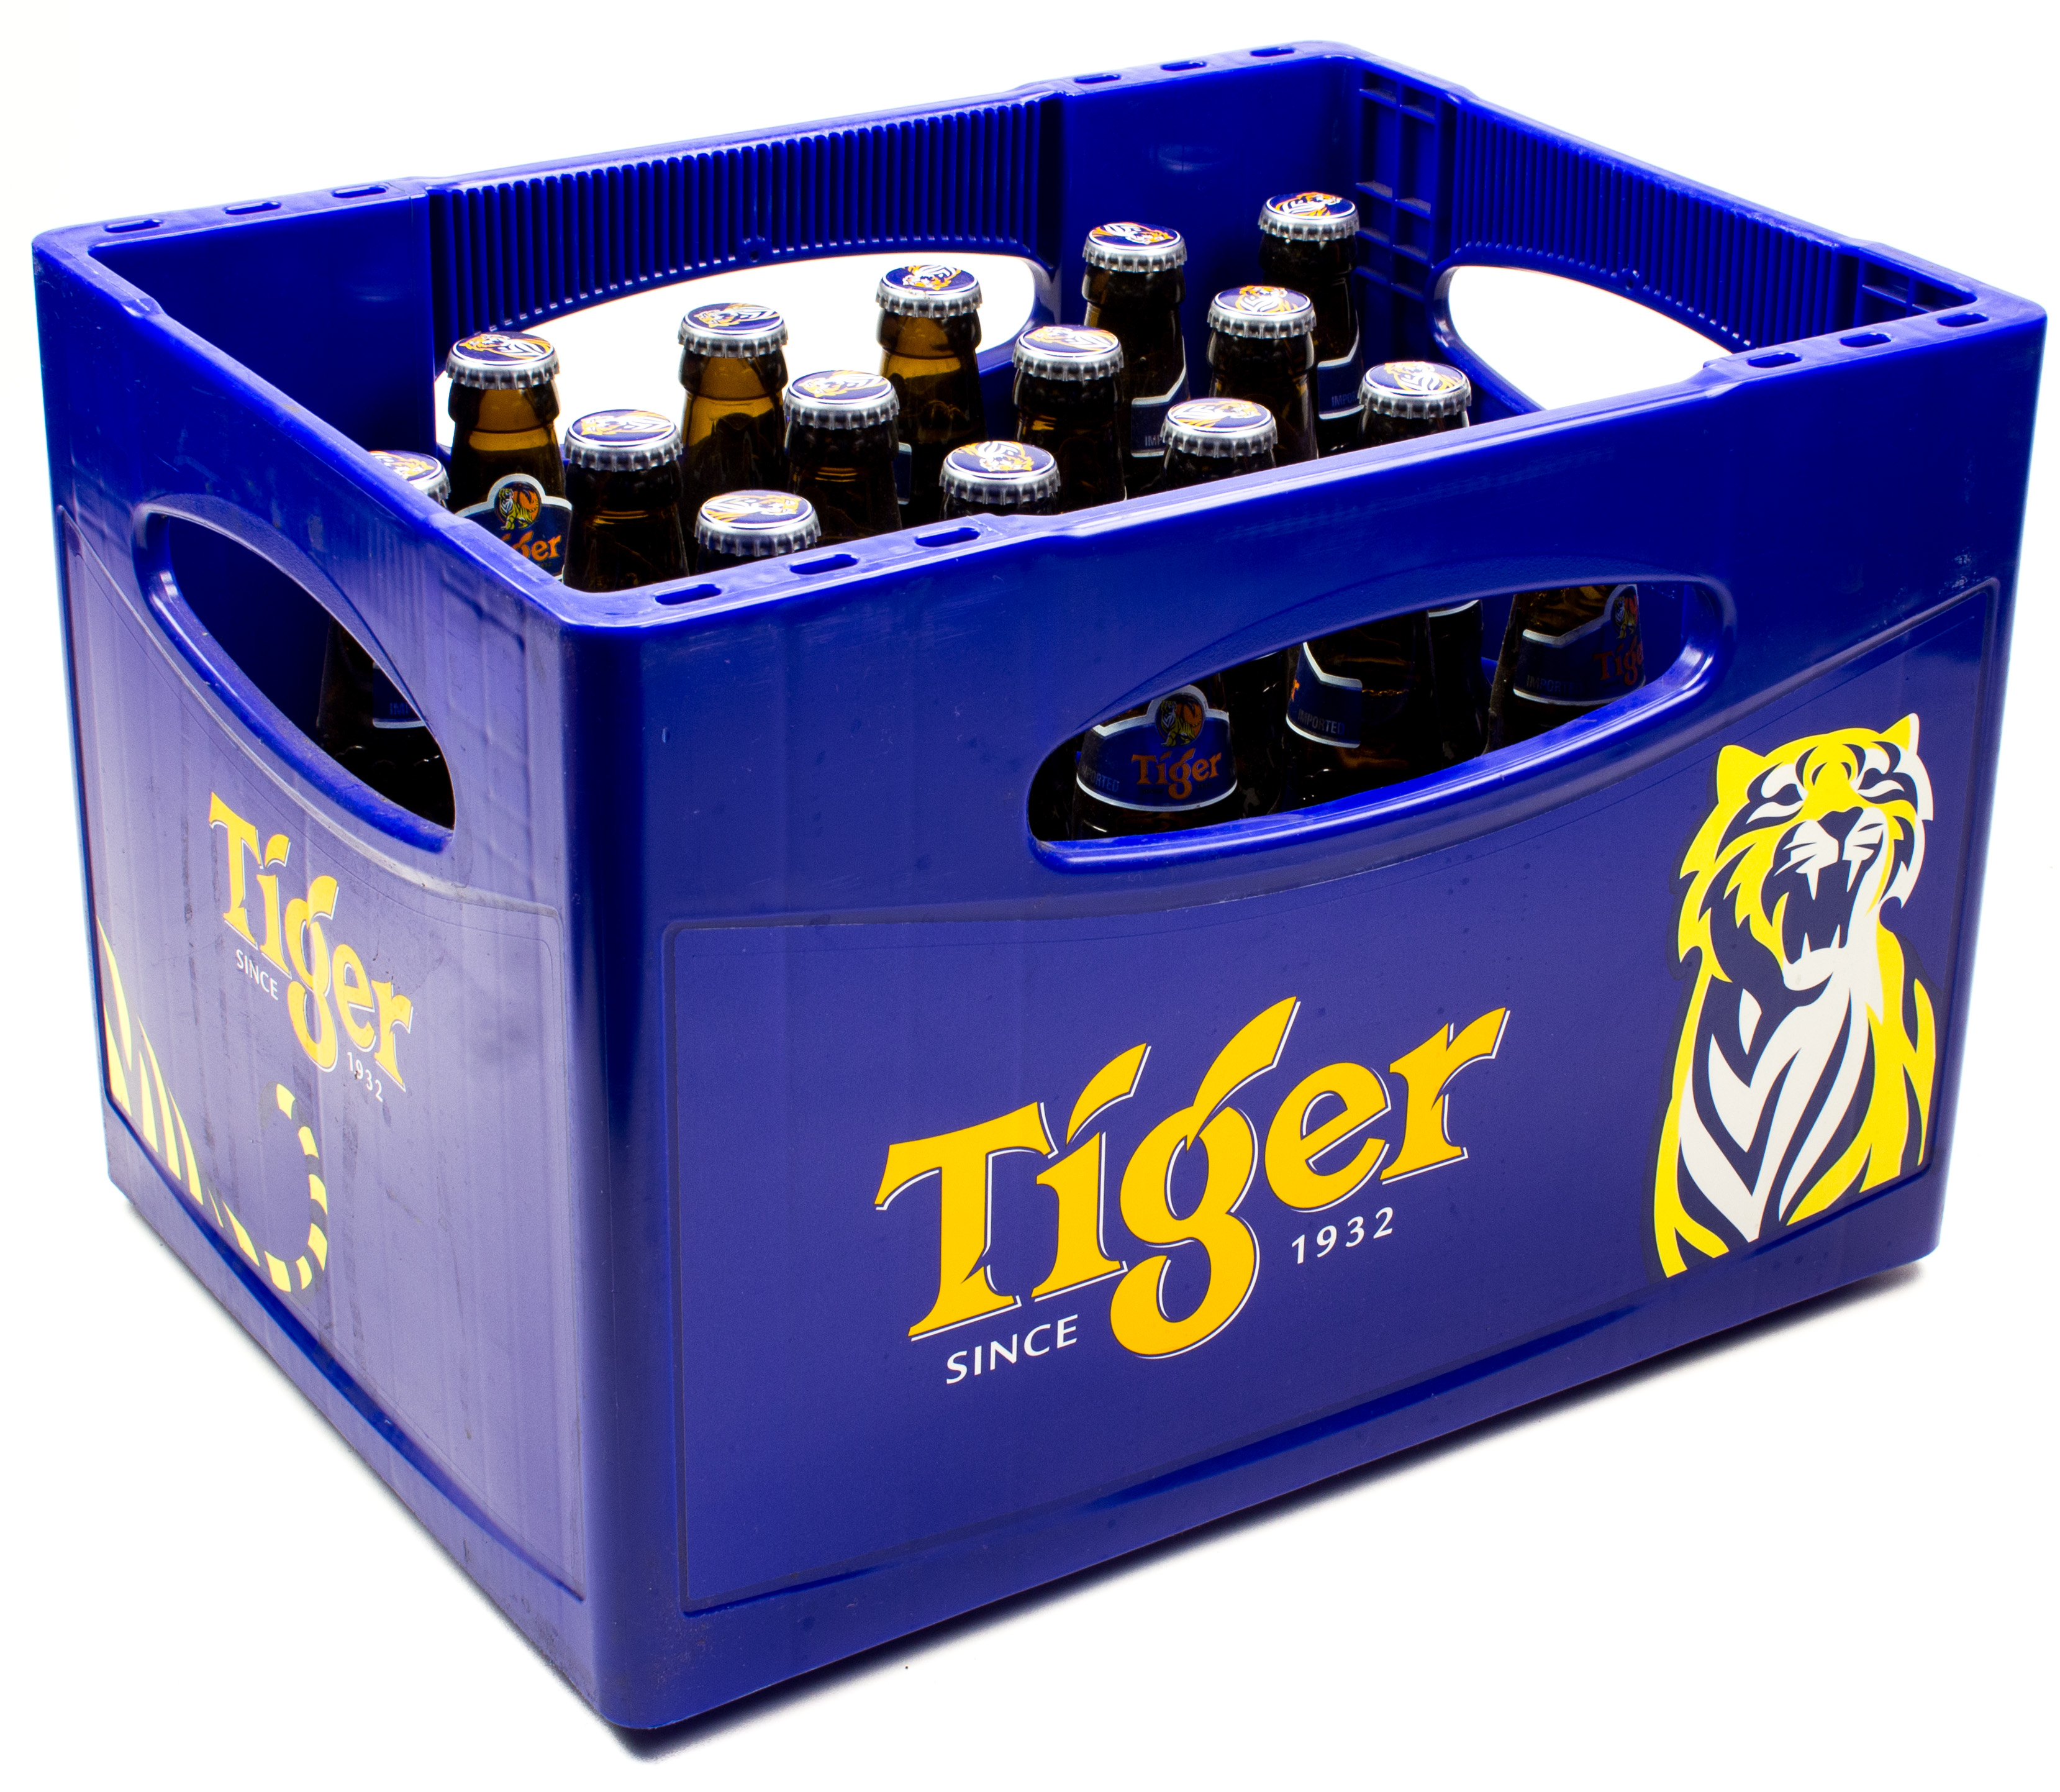 Tiger Lager Beer Kasten 24 X 033 L Glas Mehrweg